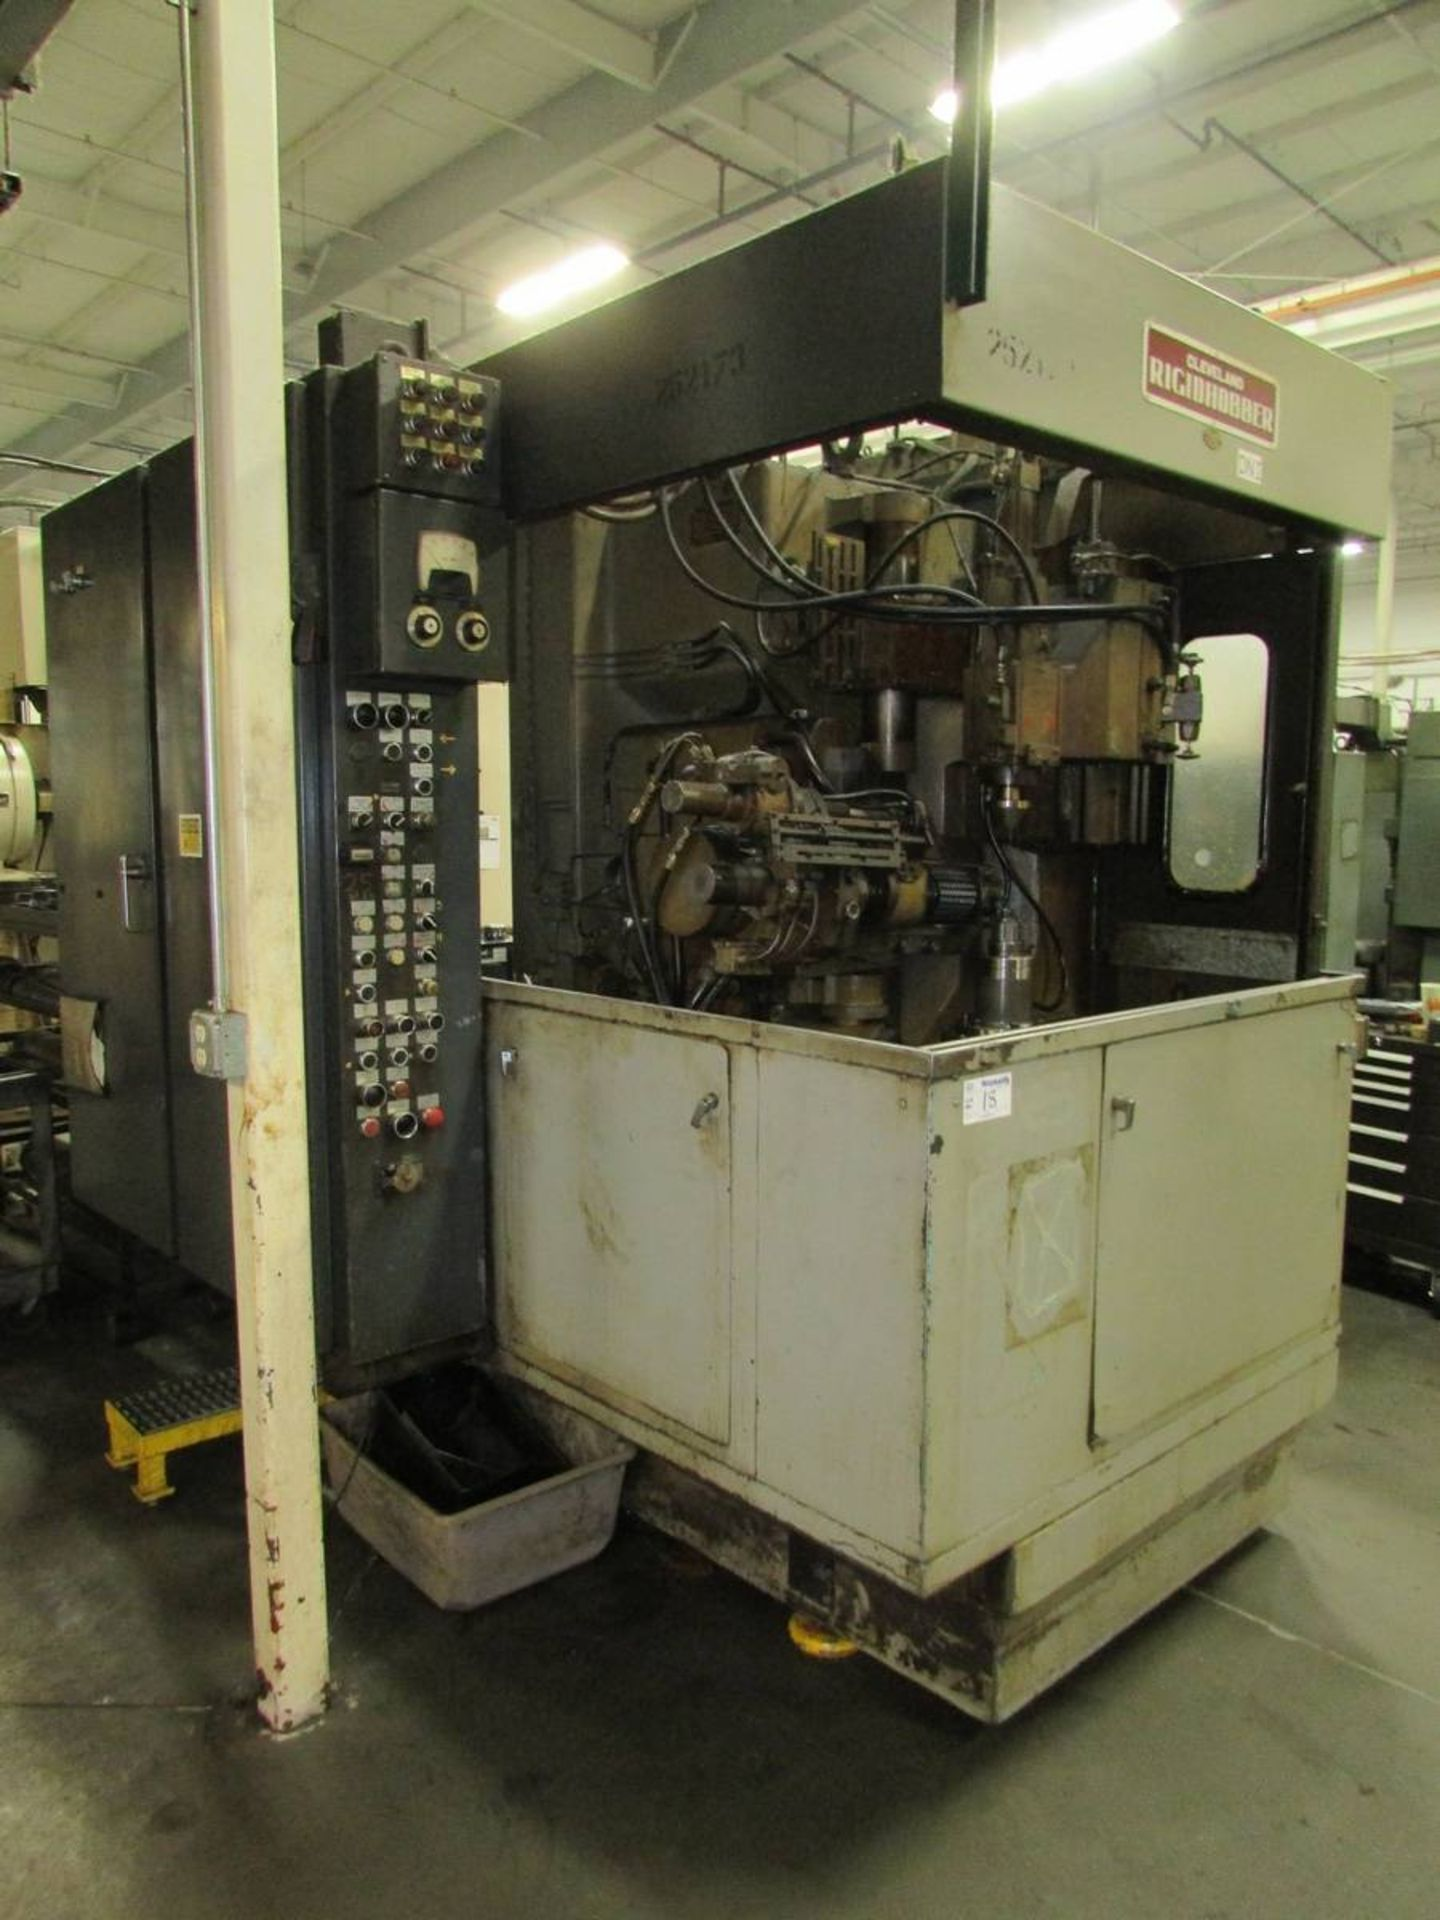 Cleveland/ Waterbury Farrel CR300-612-002 Universal CNC Gear Hobbing Machine